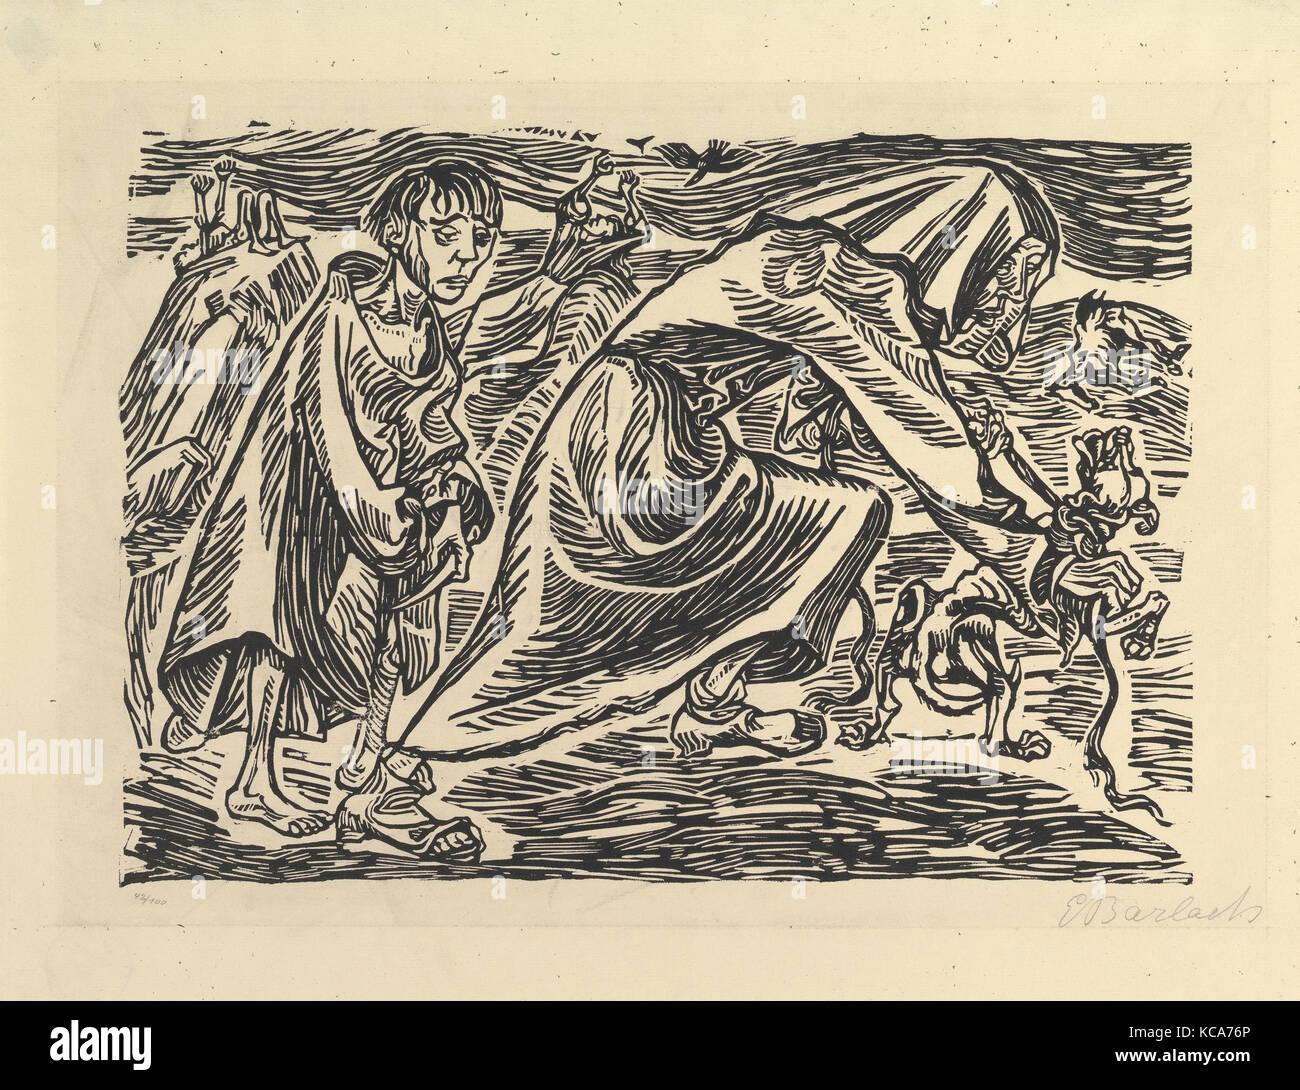 Dog Chasers (Hundefängerin), 1919, Woodcut, block: 10 x 14 3/16 inches (25.4 x 36 cm), Prints, Ernst Barlach - Stock Image